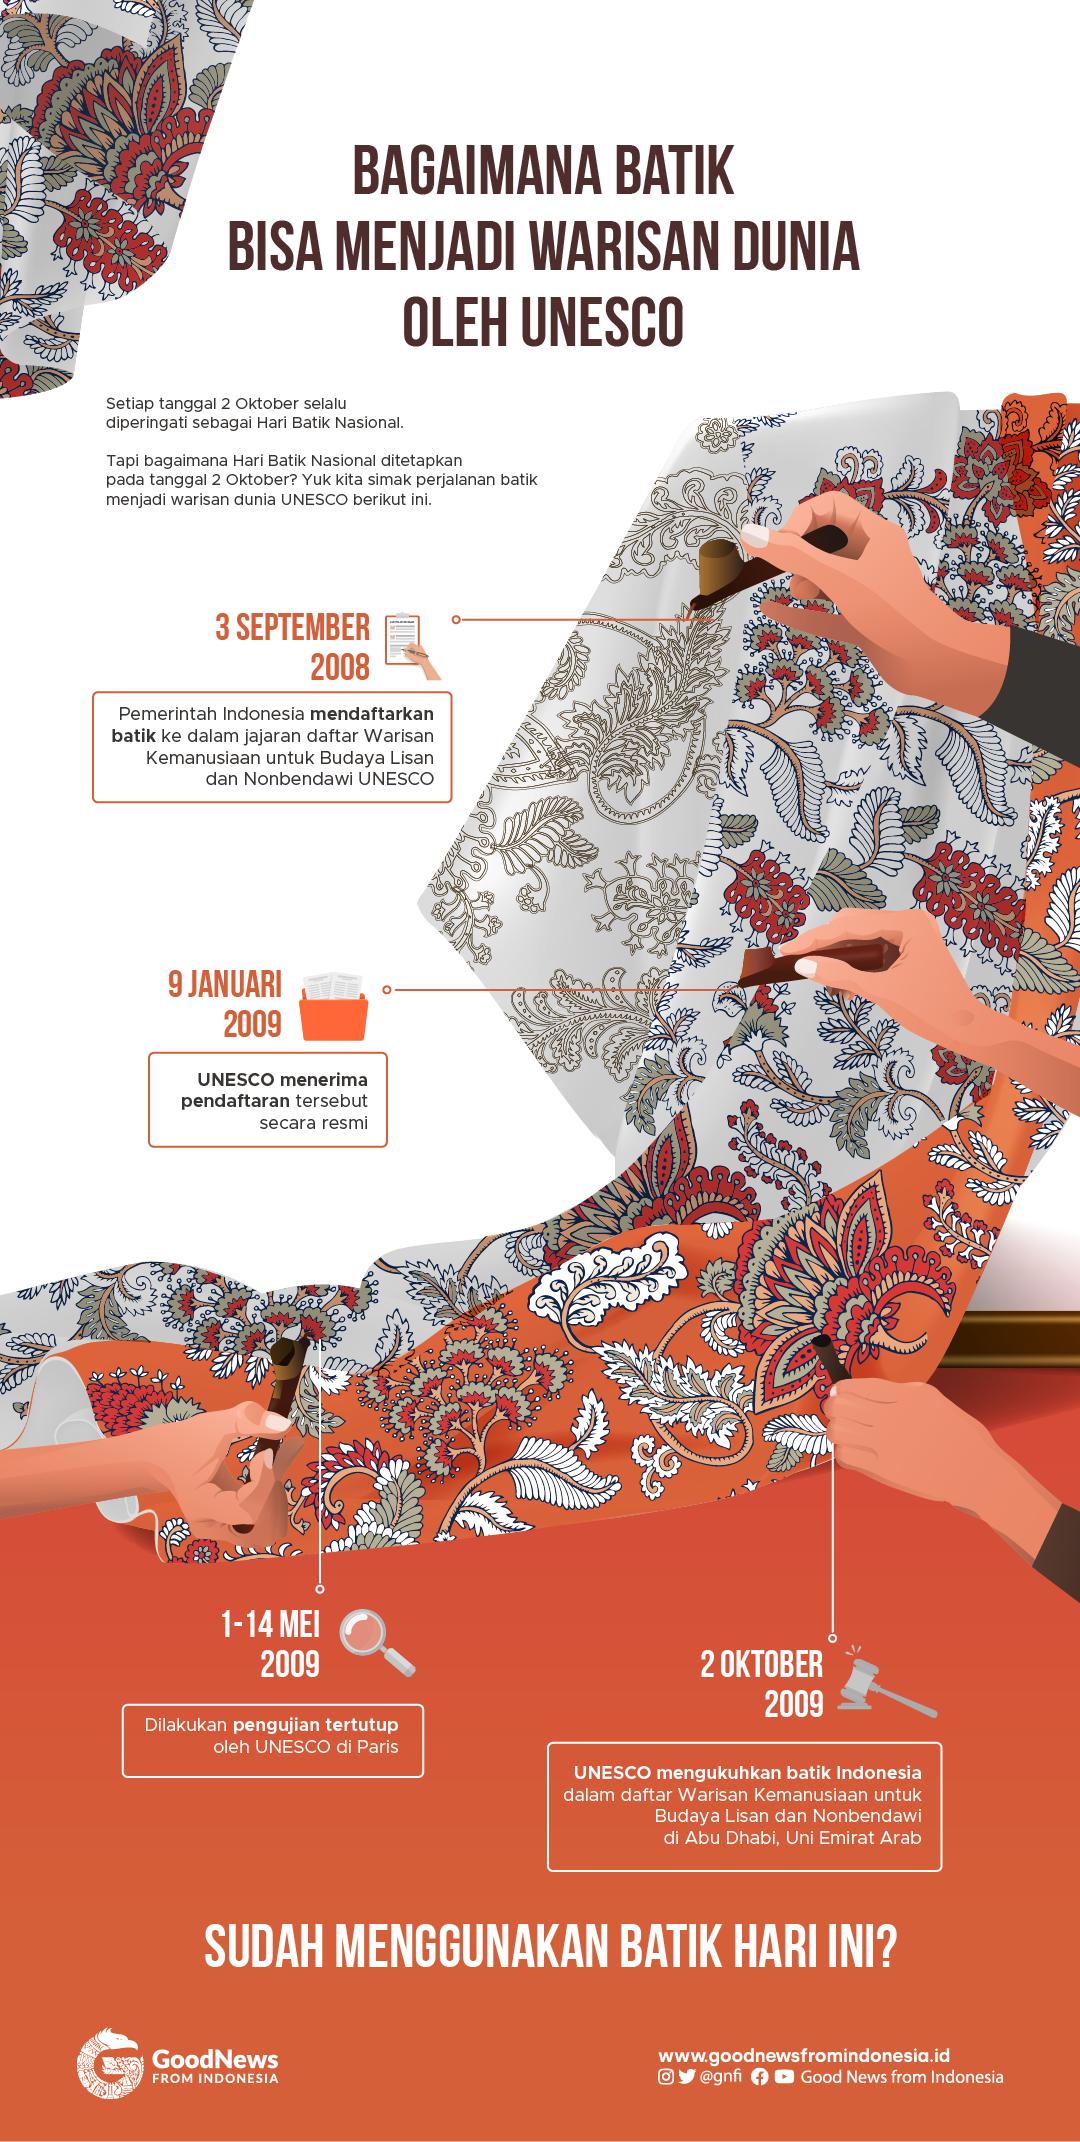 Di Balik Cerita Soal Batik yang Menjadi Warisan Dunia